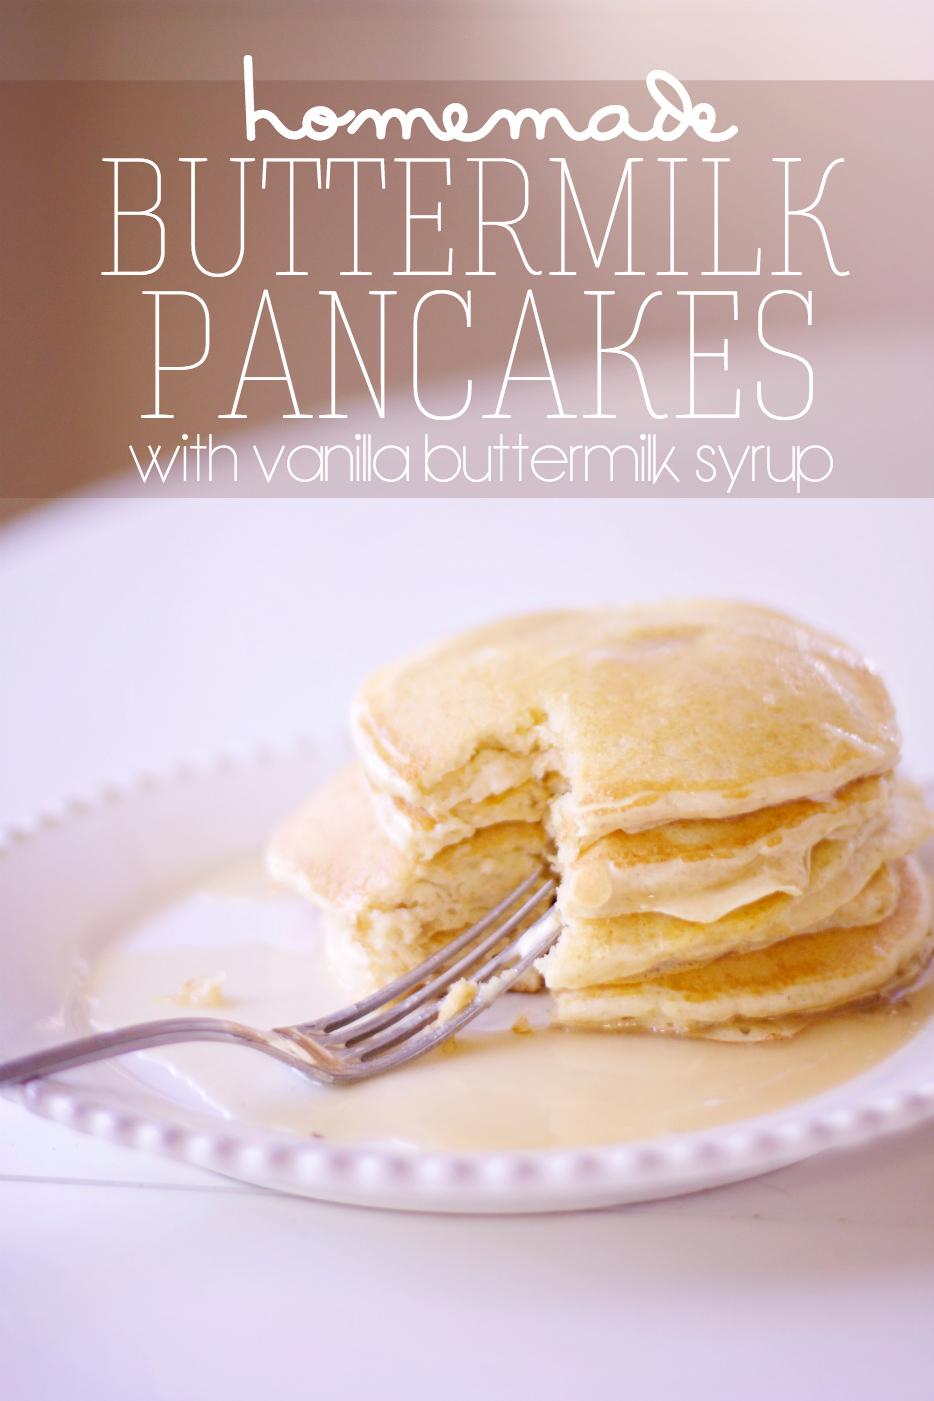 buttermilkpancakes.jpg